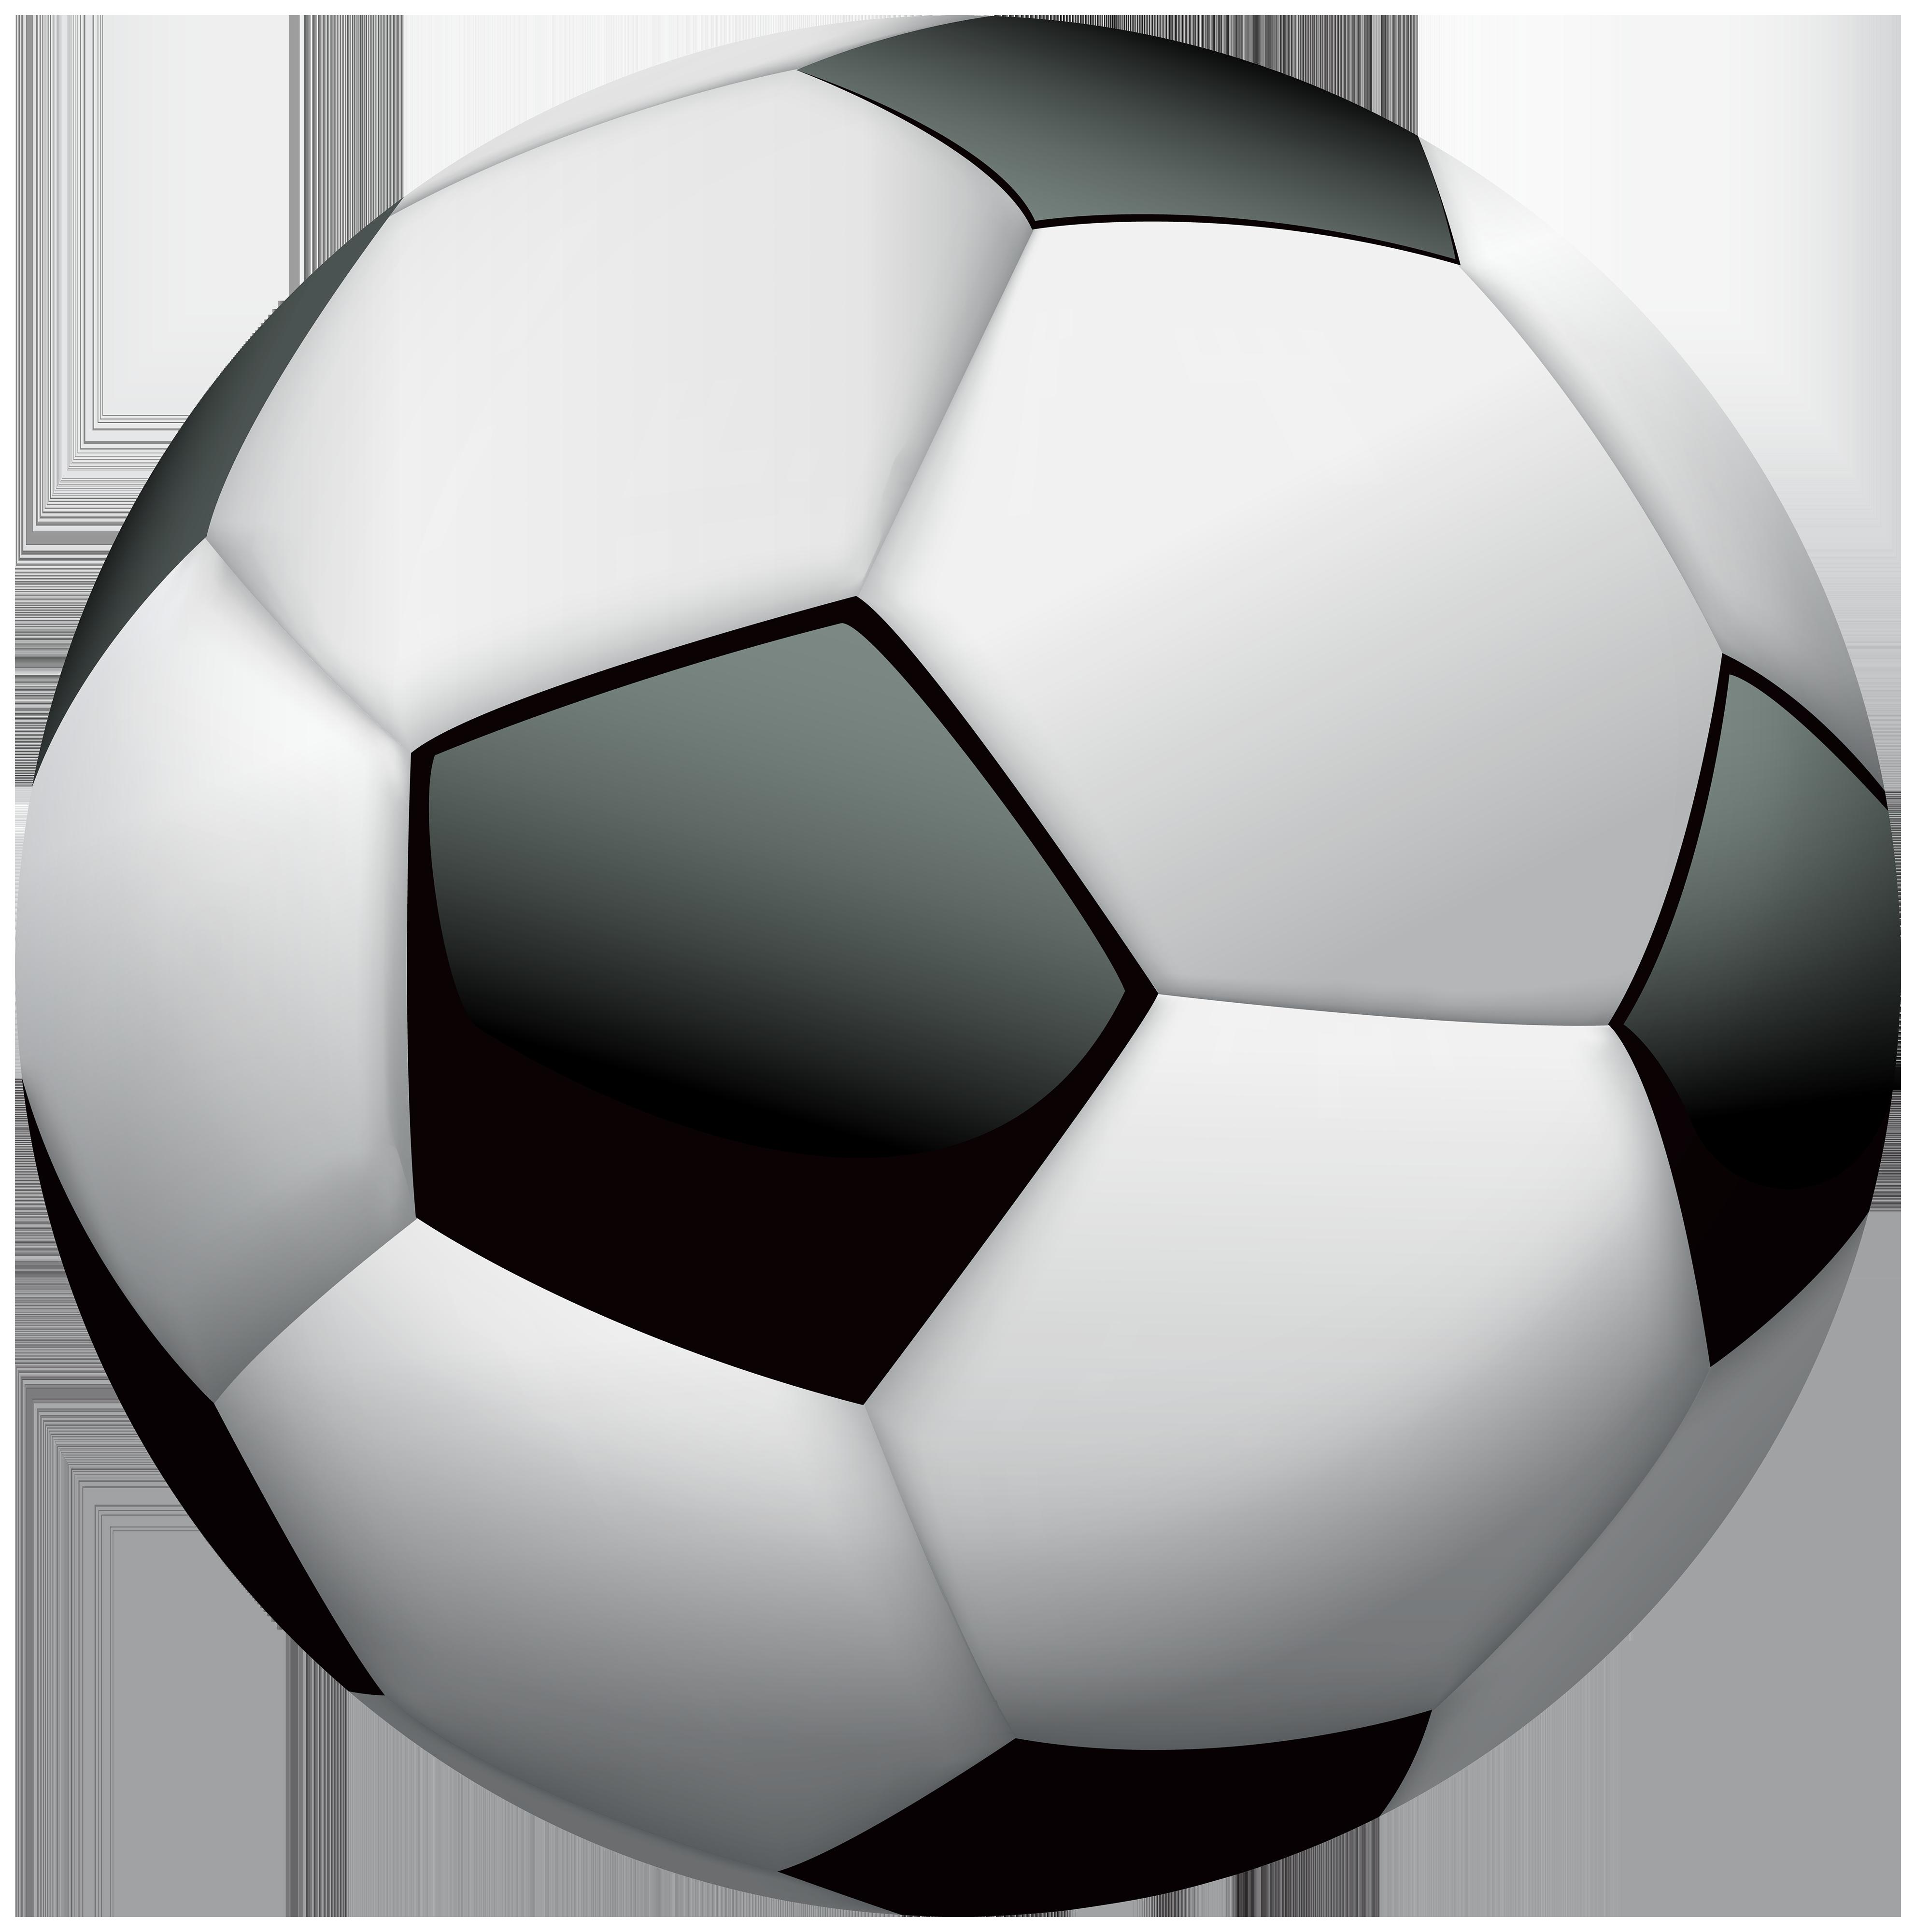 Soccer ball clip art 2 4